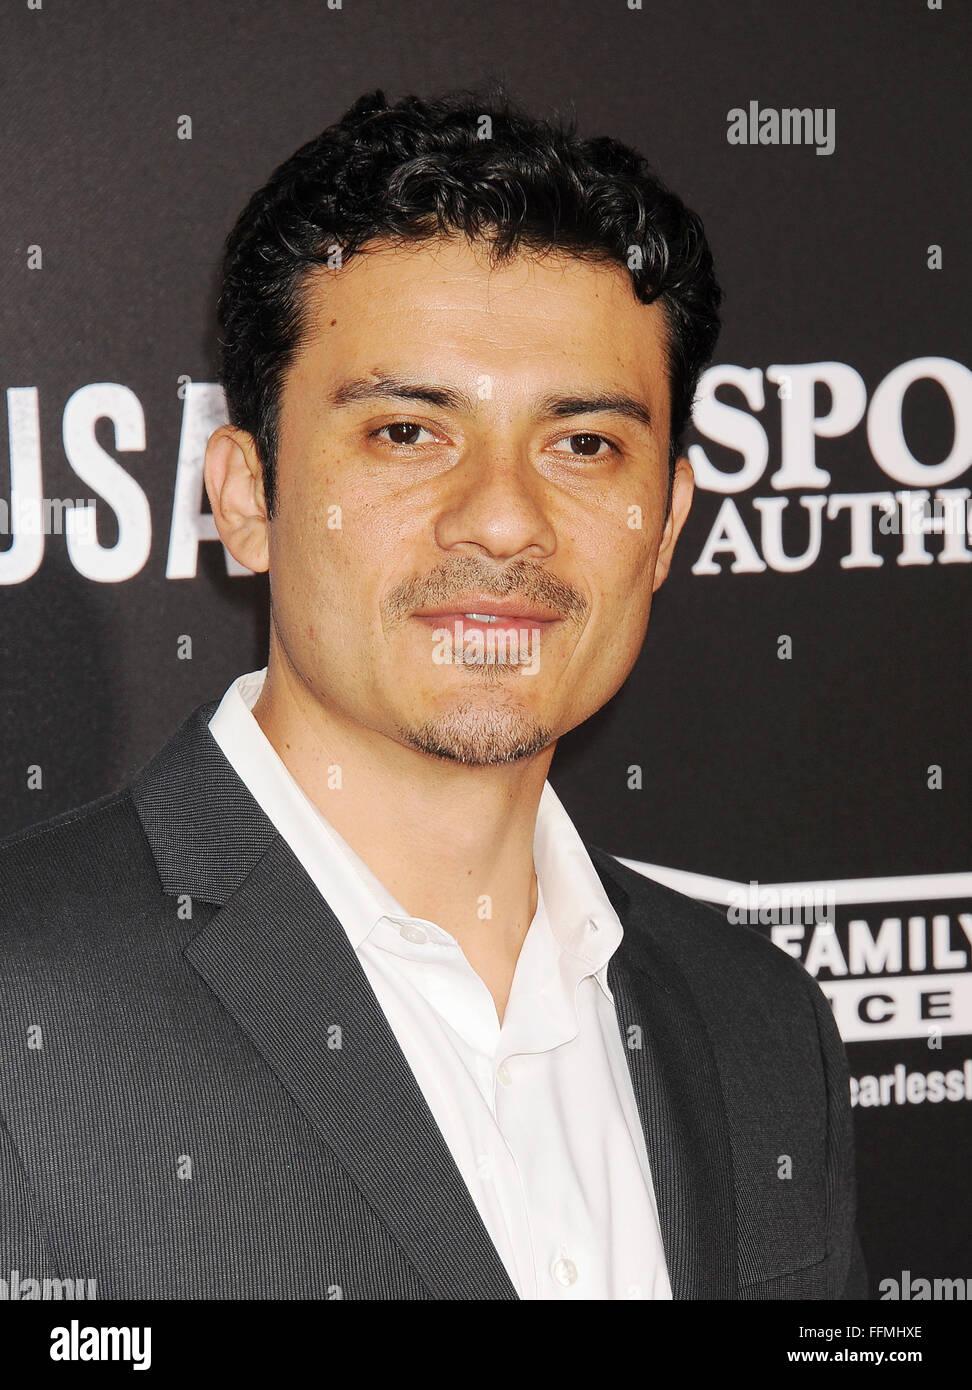 Actor Rigo Sanchez arrives at the World Premiere of Disney's 'McFarland, USA' at the El Capitan Theatre - Stock Image